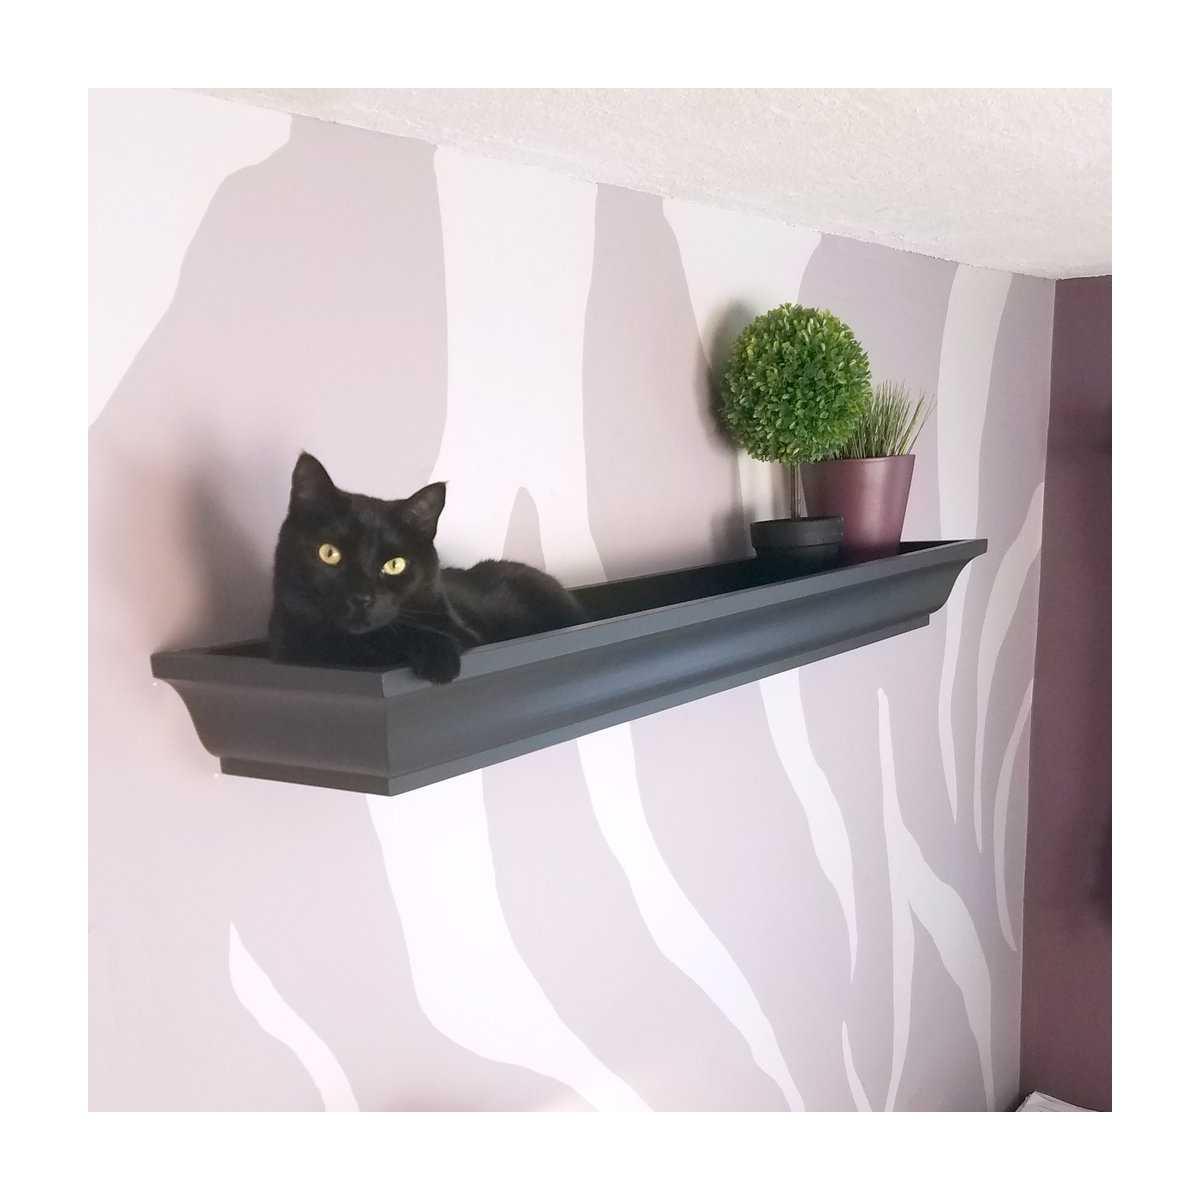 Cat Crown Wall Shelf Bed Catsplay Superstore